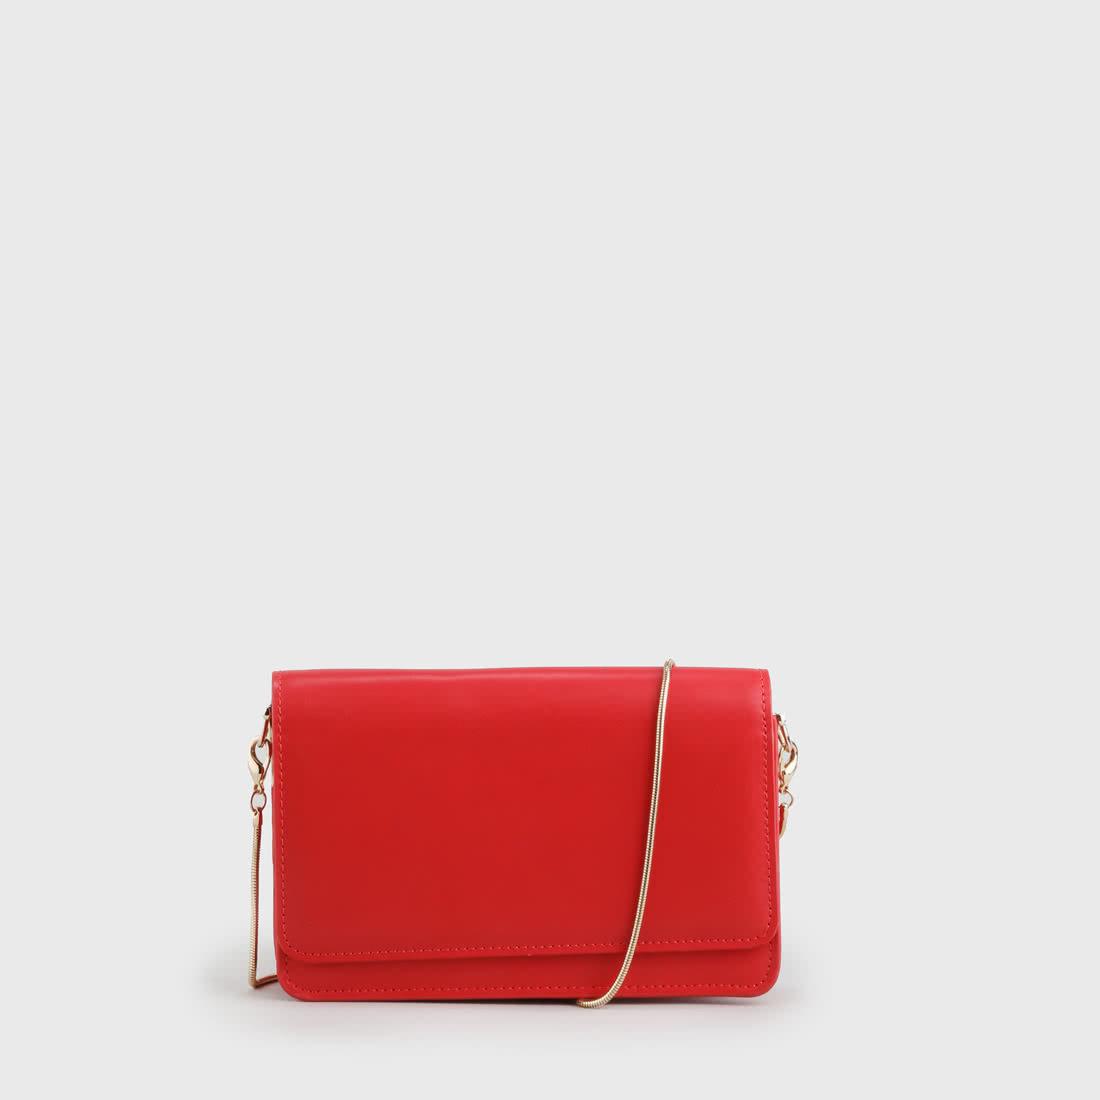 726d98701f976c Chloe Clutch Lackoptik rot online kaufen